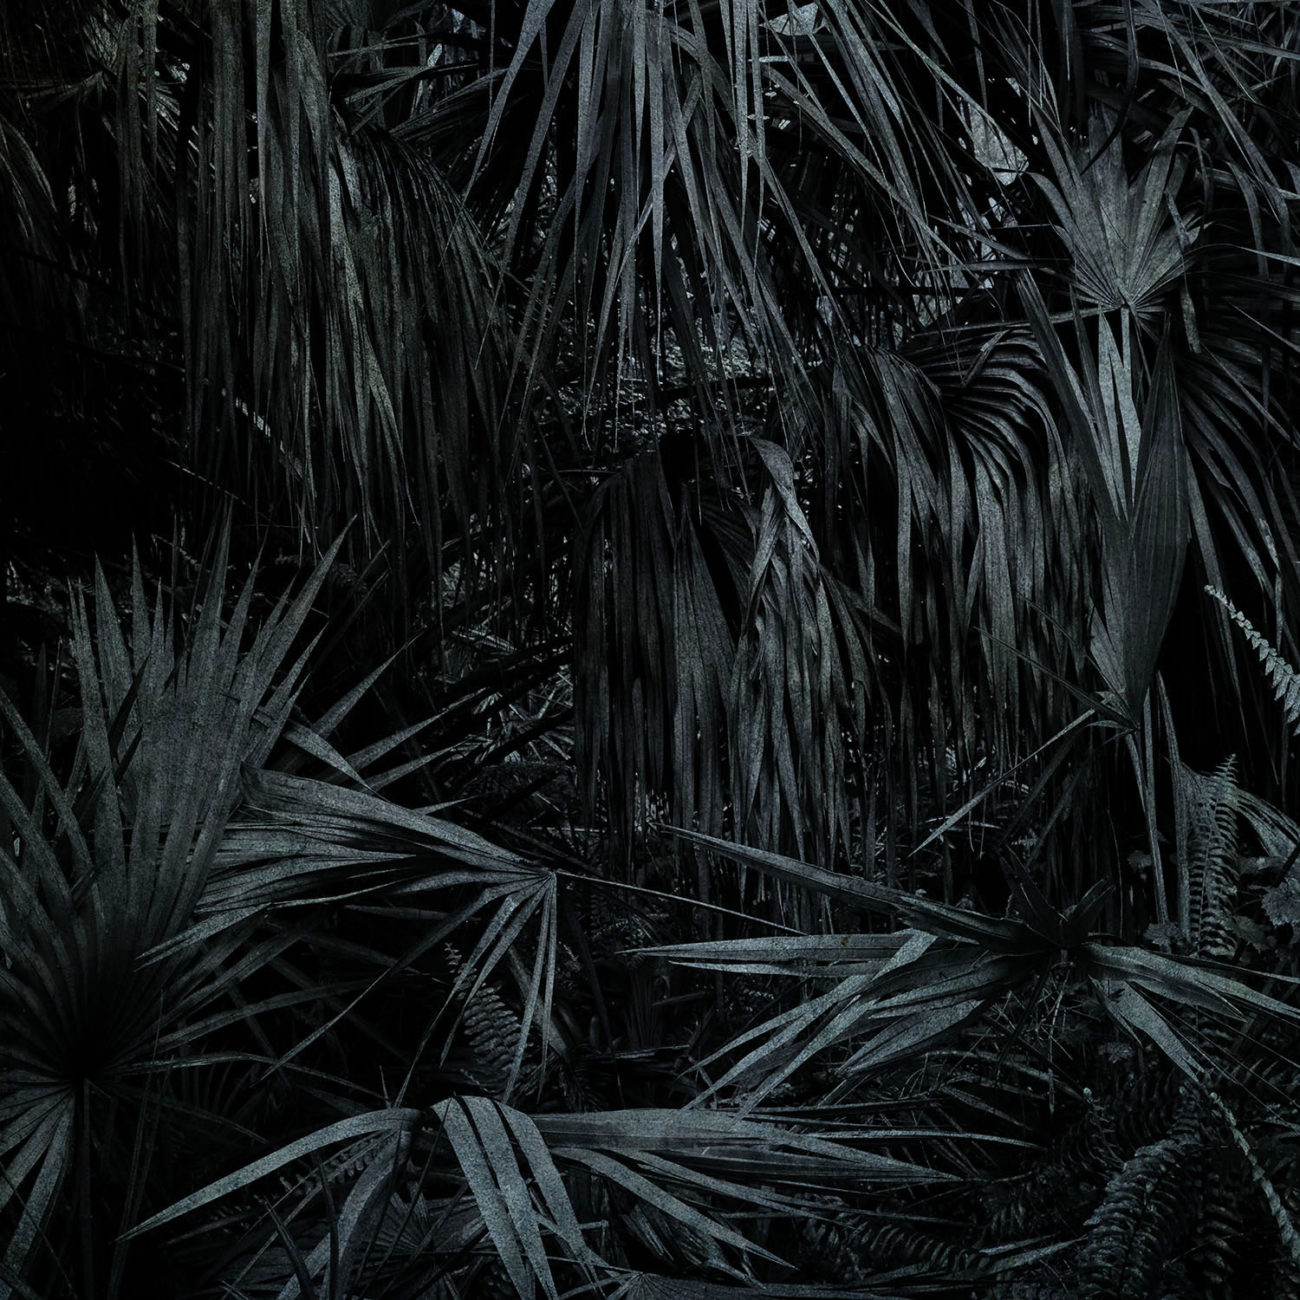 Sabal palms, Study in blue II, 2019